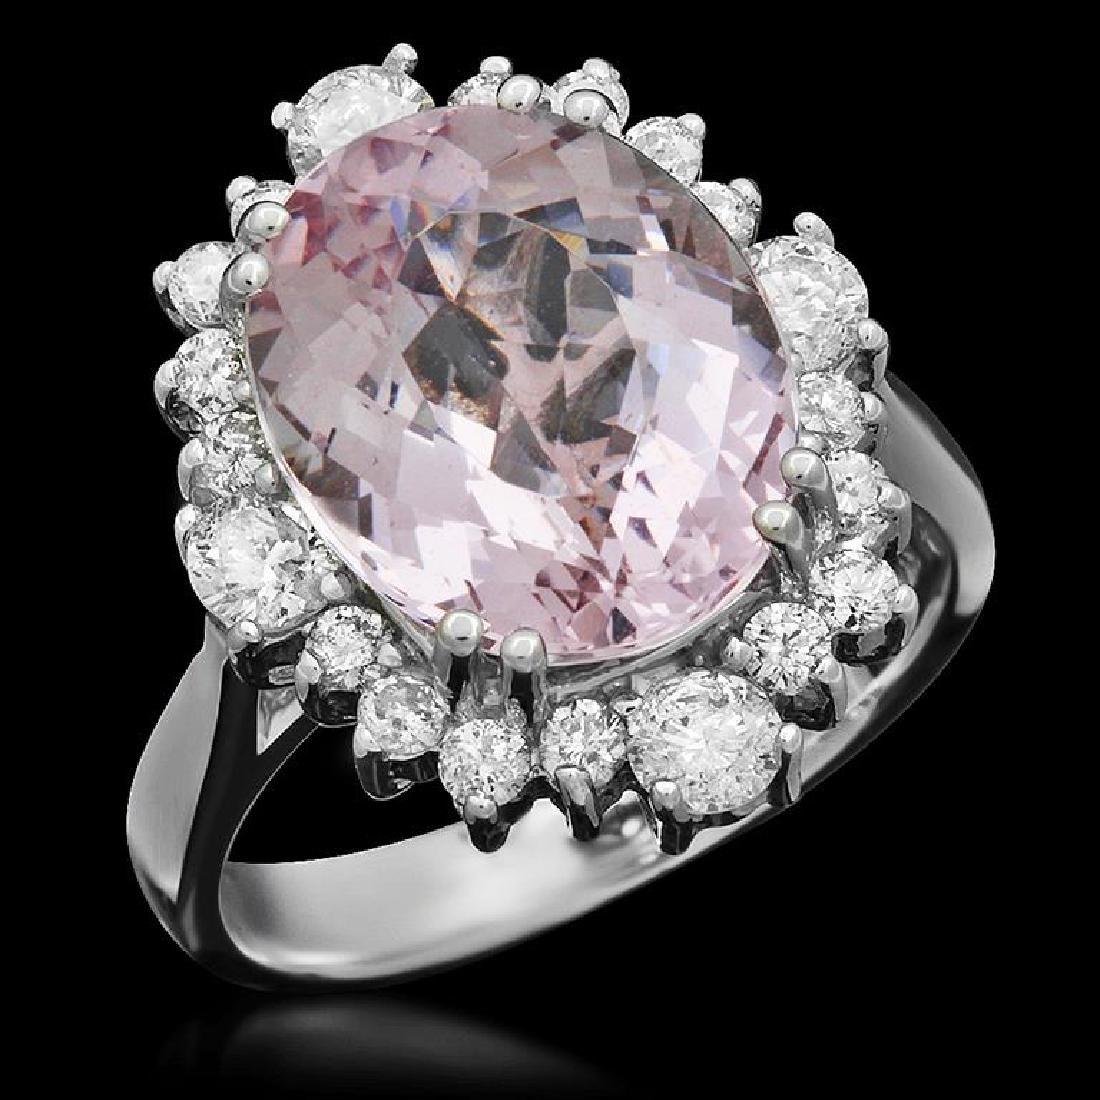 14k Gold 5.21ct Morganite 1.10ct Diamond Ring